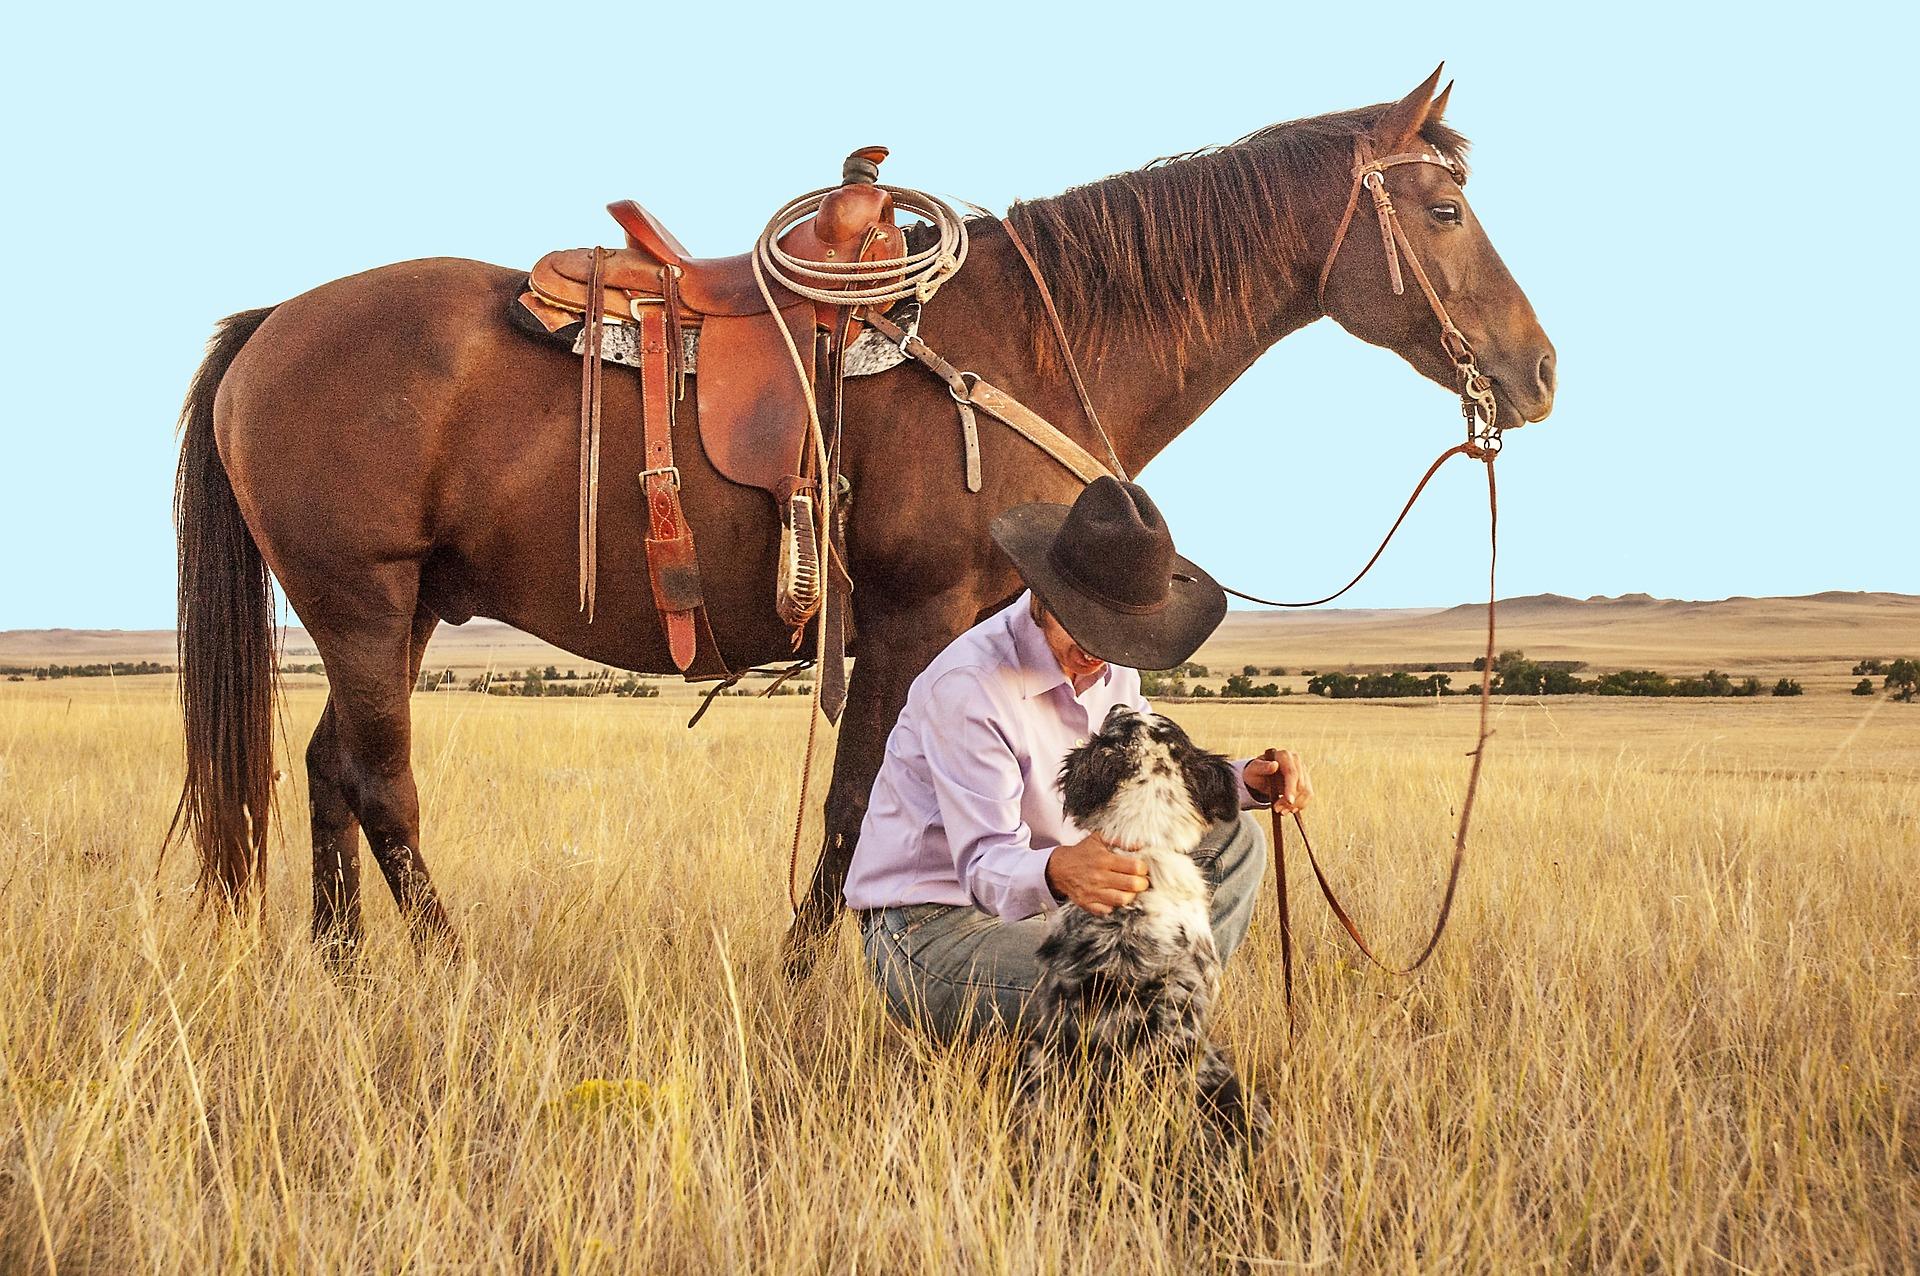 cowboy-1130695_1920